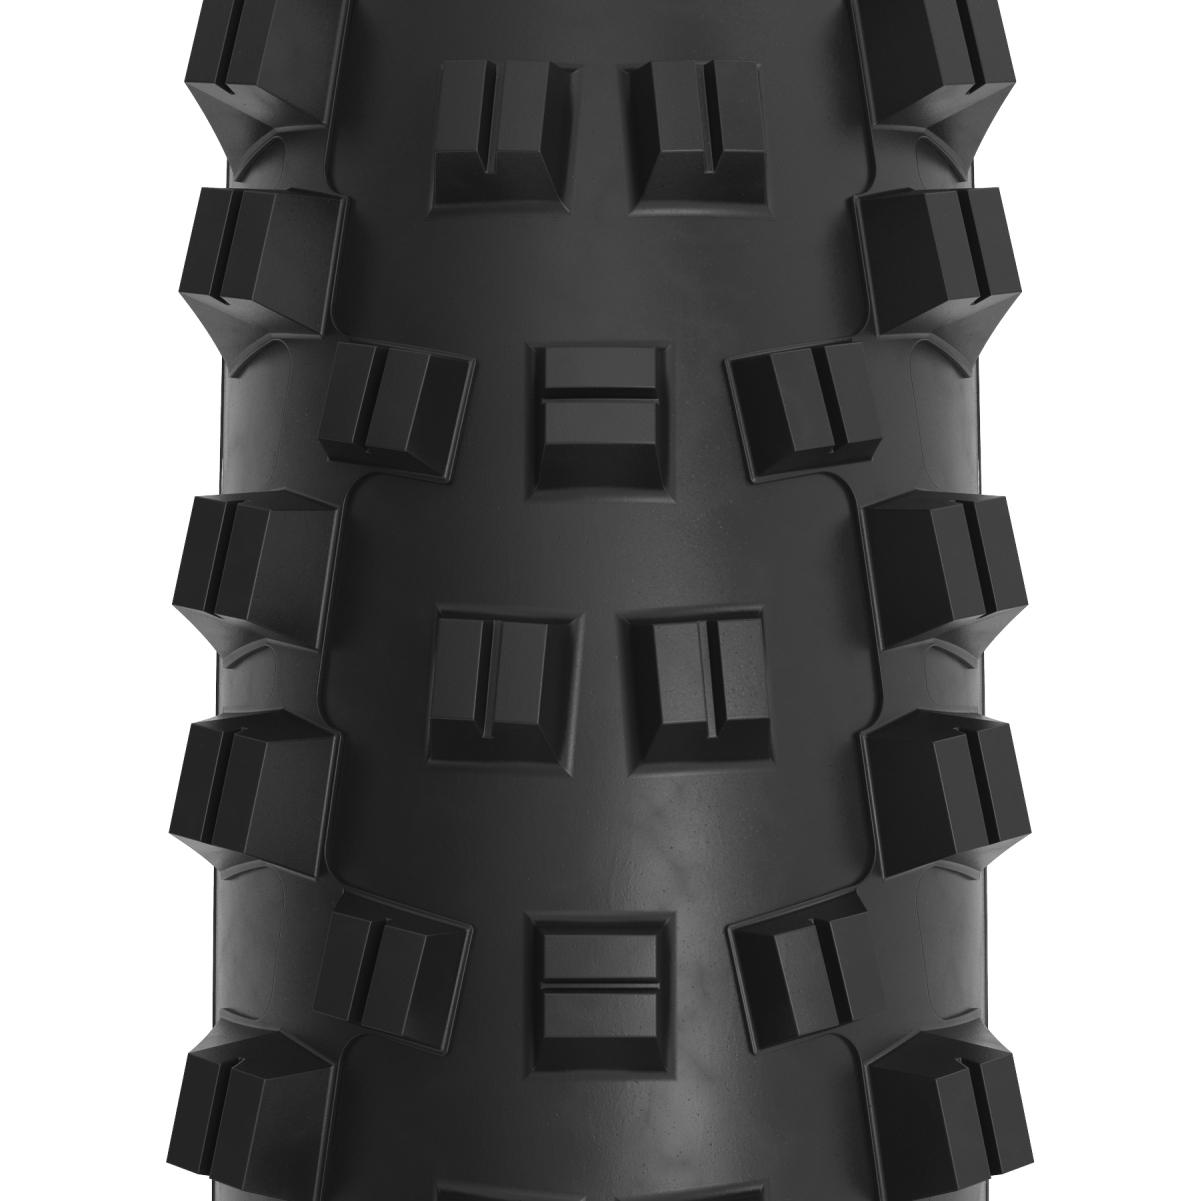 Bild von WTB Vigilante 2.6 TCS Tough/Fast Rolling MTB-Faltreifen - 27.5x2.6 Zoll - schwarz